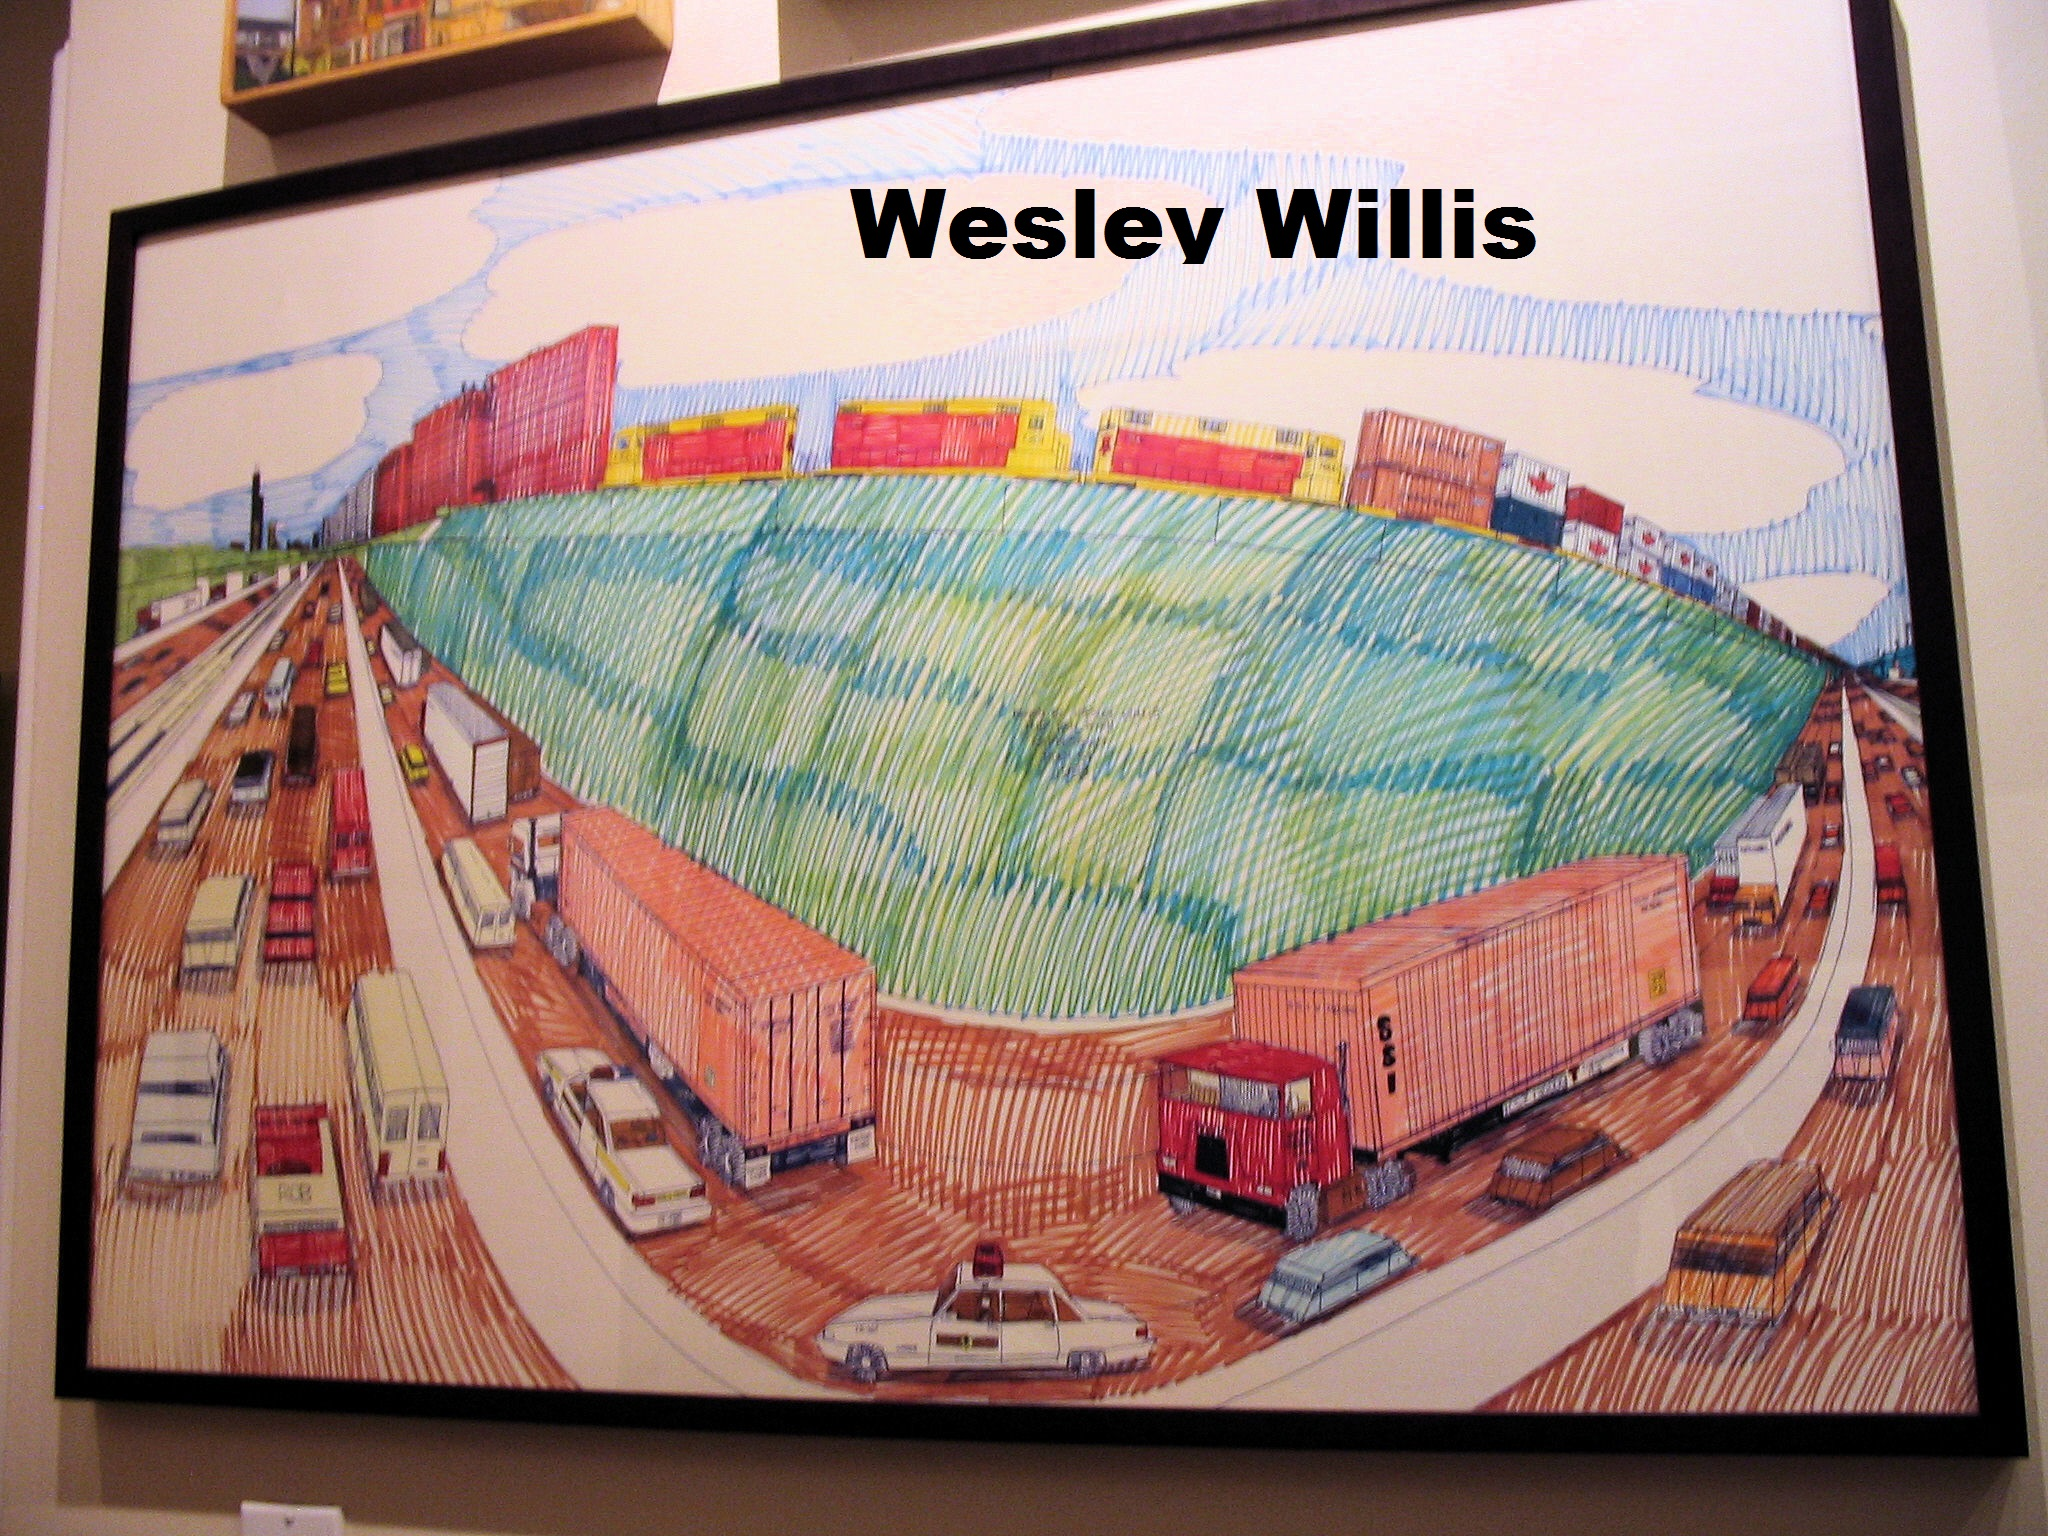 Wesley Willis, Dan Ryan 1993 2.jpg